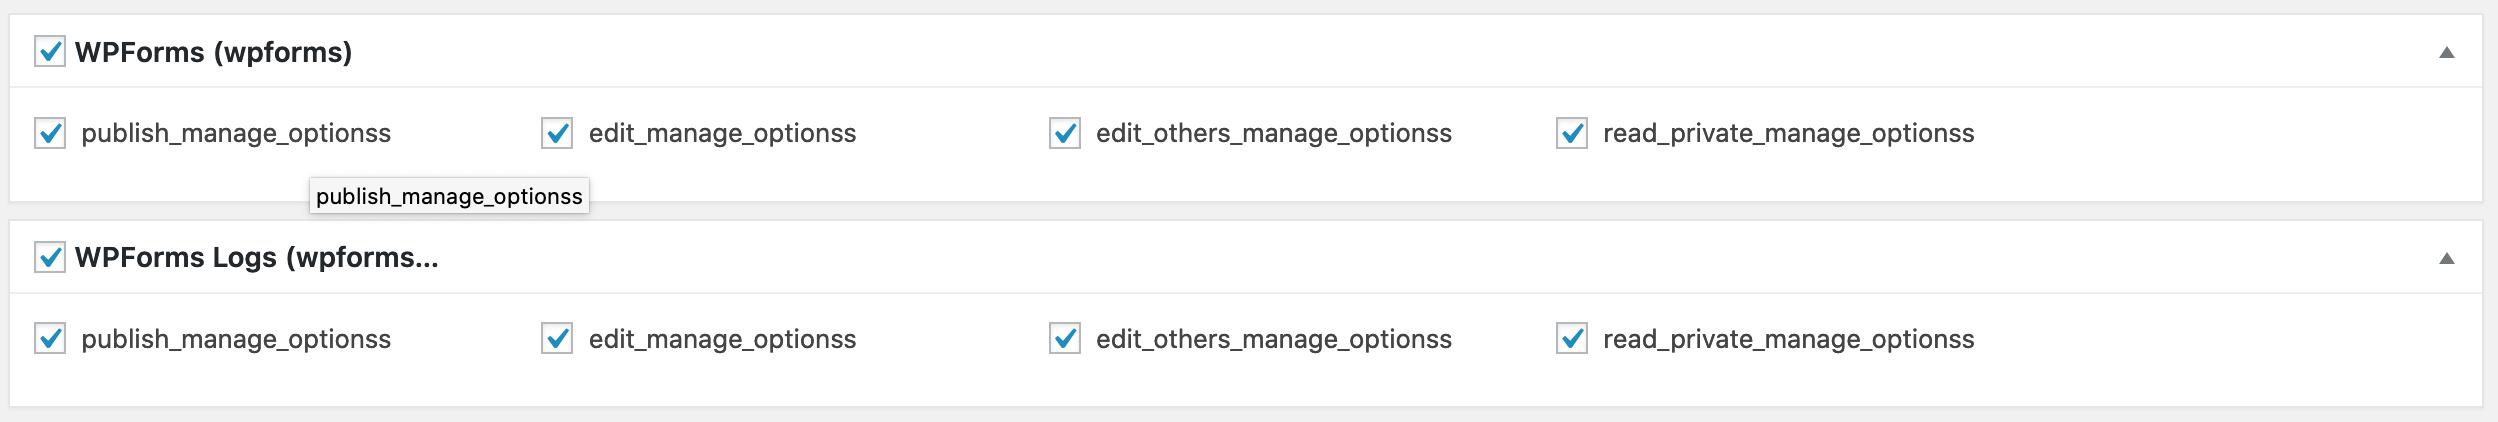 roles:editor (1)